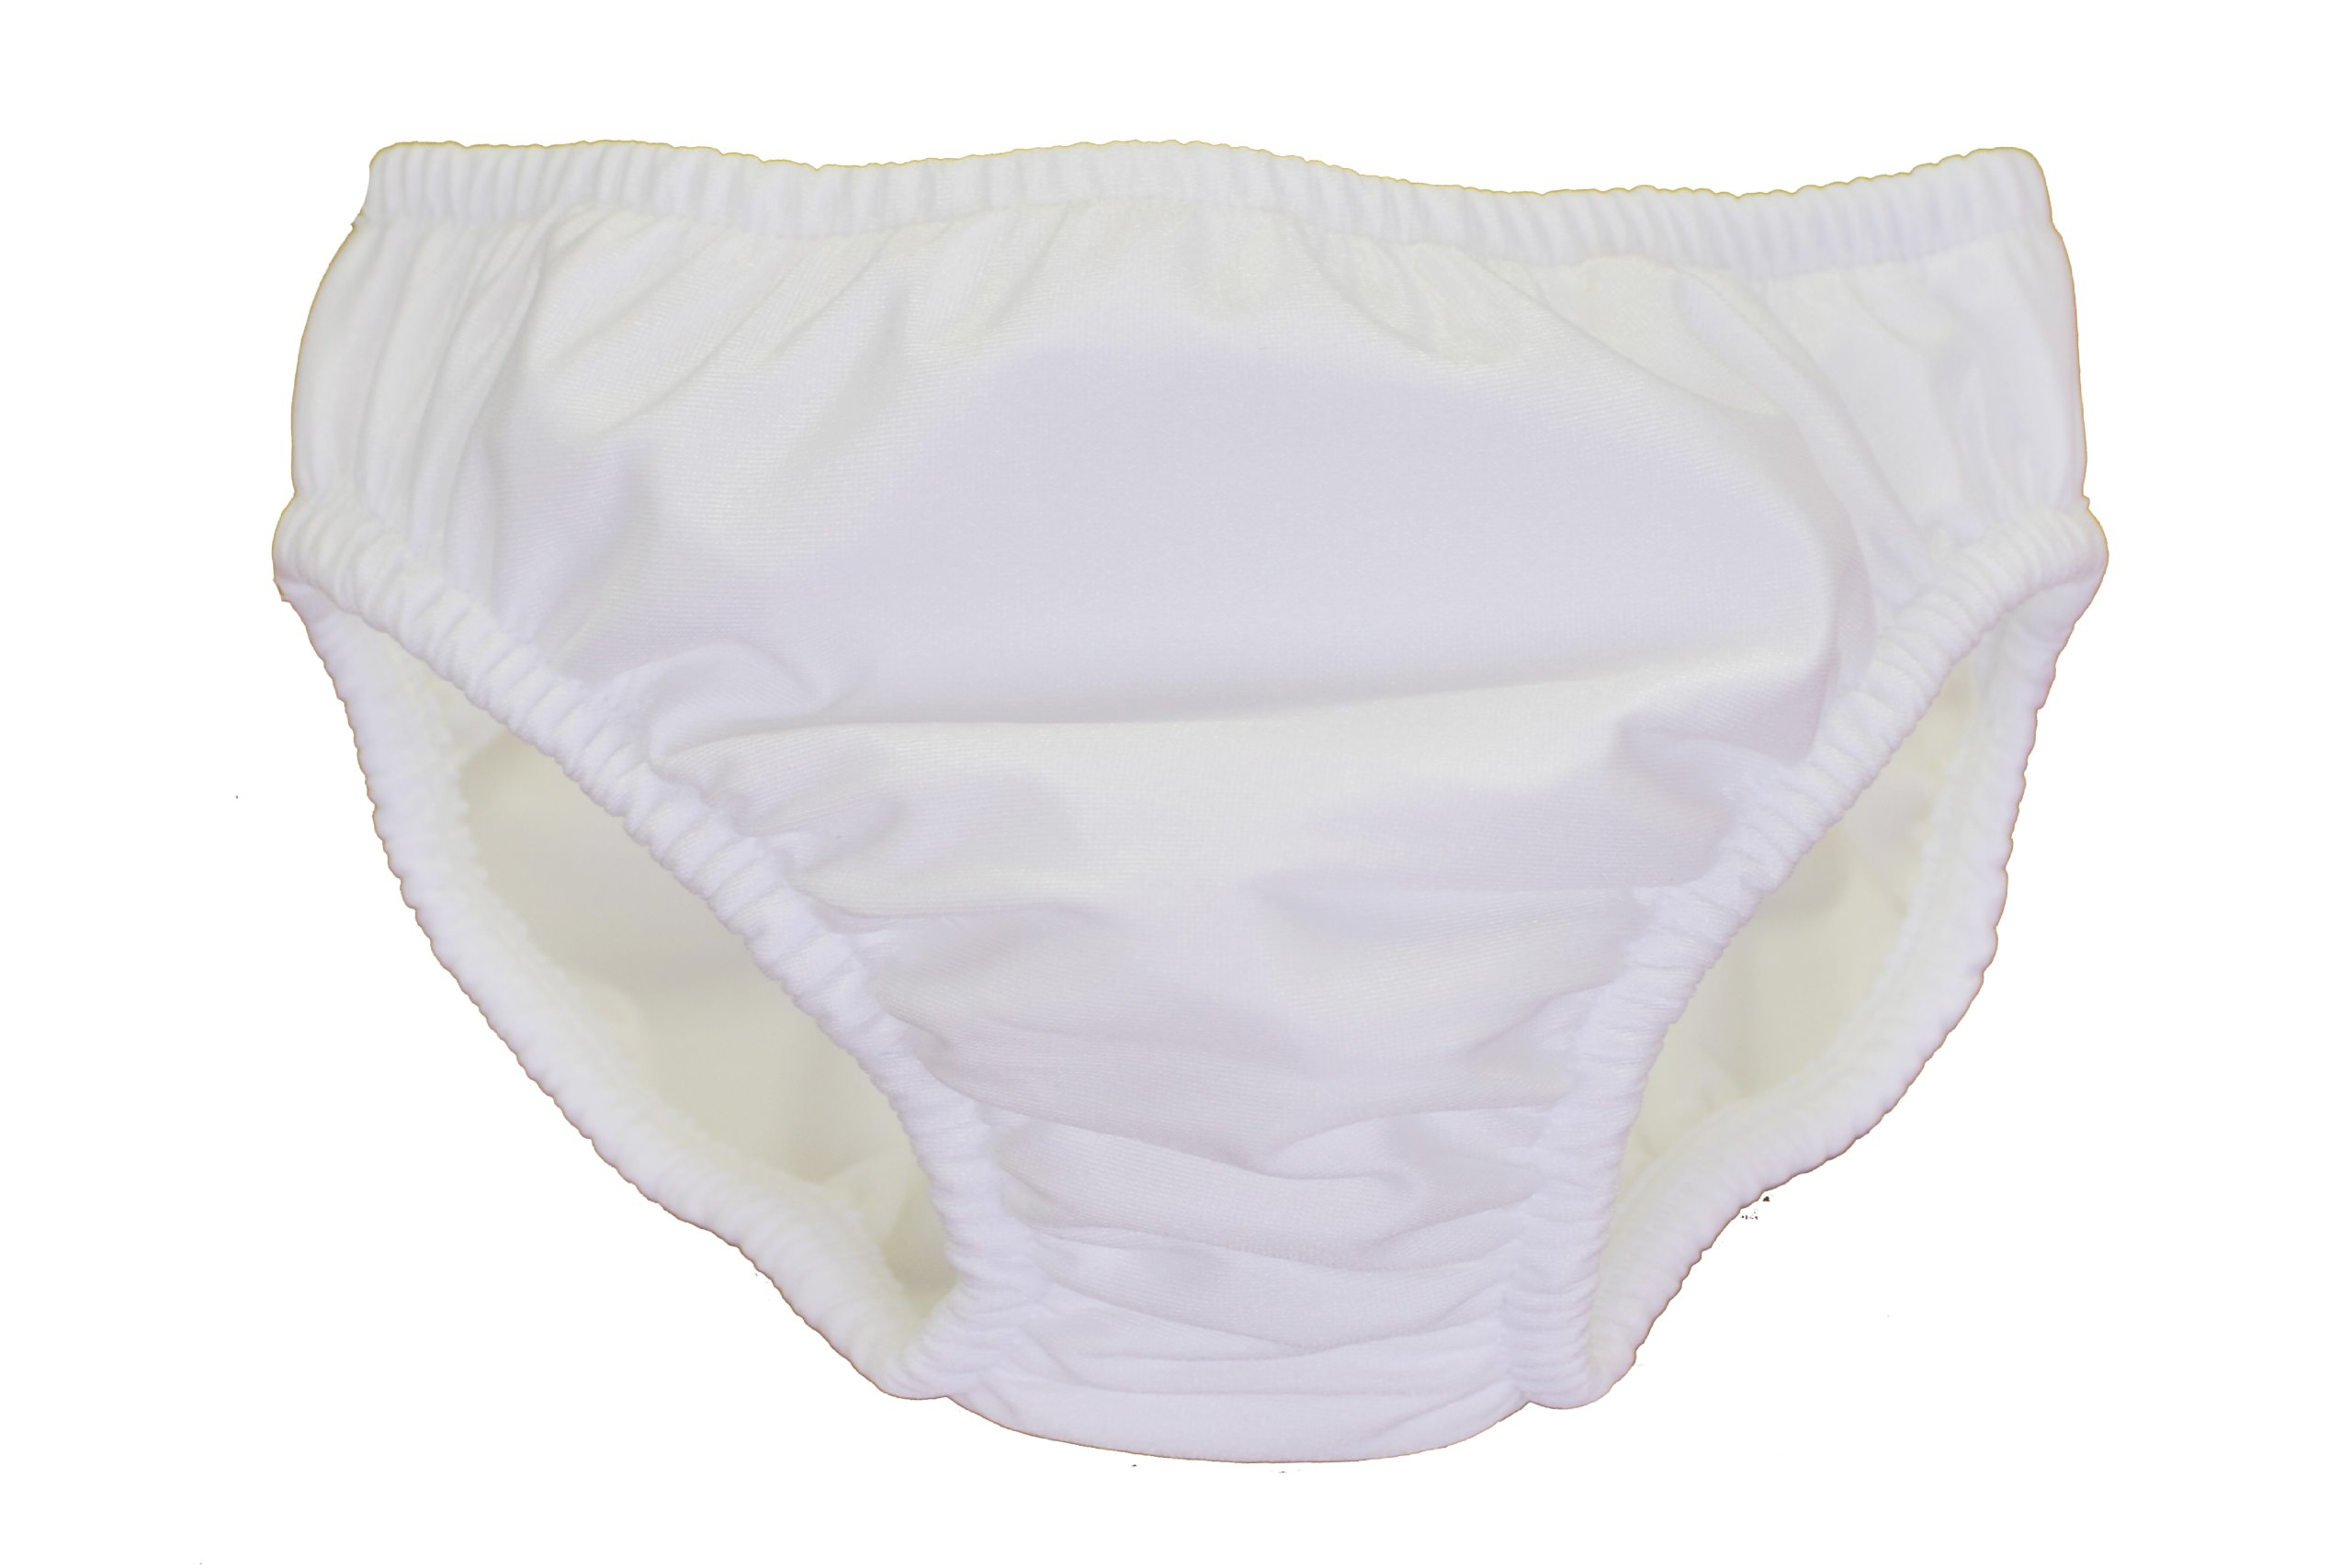 My Pool Pal Reusable Swim Diaper, White, 2T